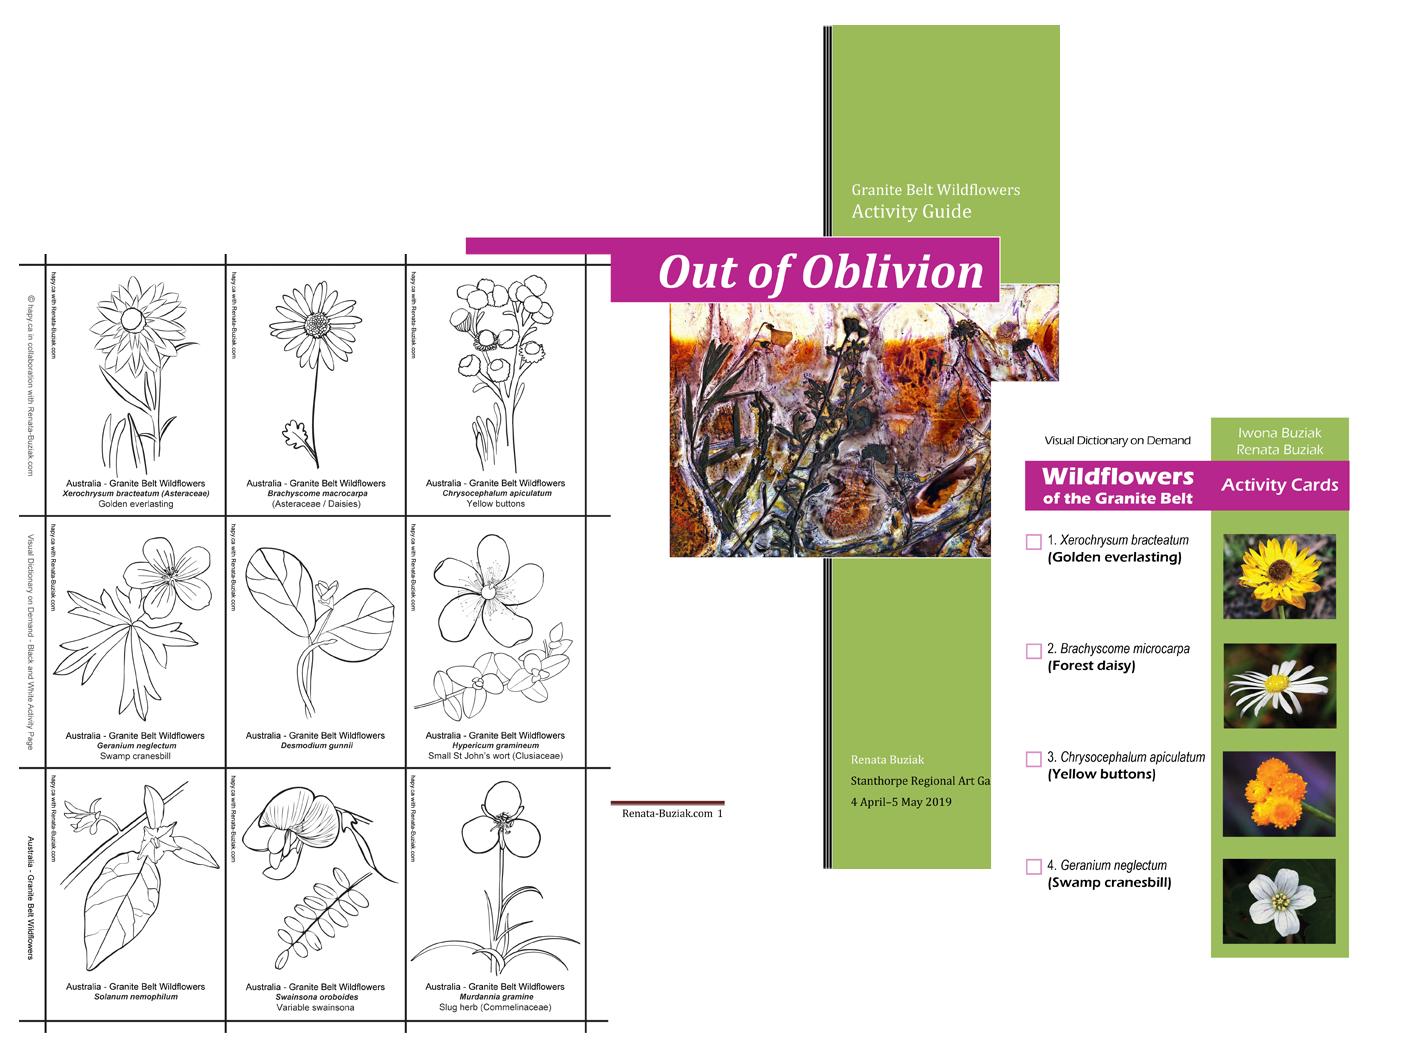 Catalogue Cover-Medicinal-Plant-Cycles-Renata Buziak-renatabuziak.com